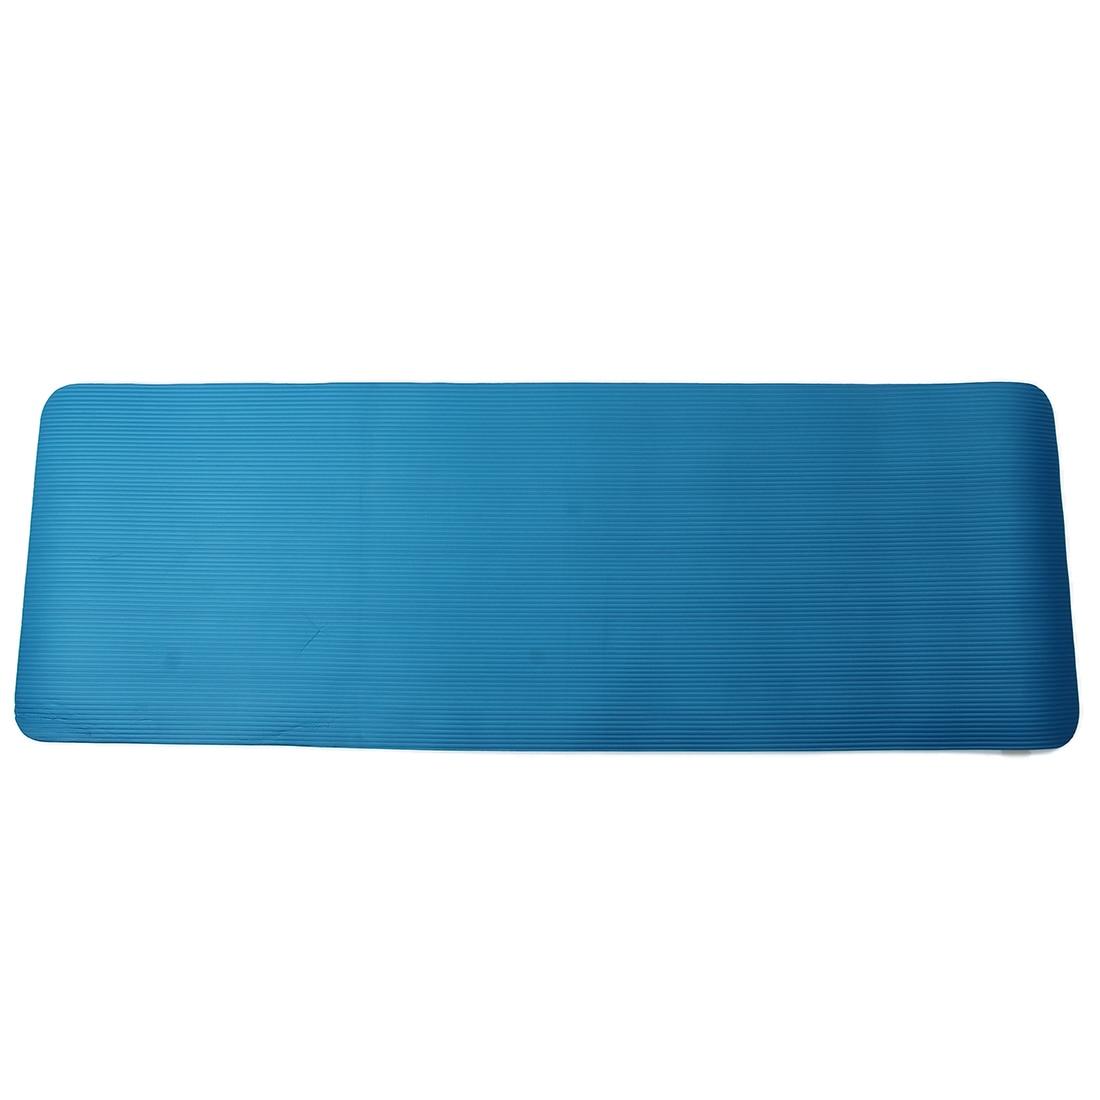 Tapete De Yoga 15mm De Espessura Physio Pilates Gin Sio Exerc Cio  -> Tapete Para Sala De Pilates